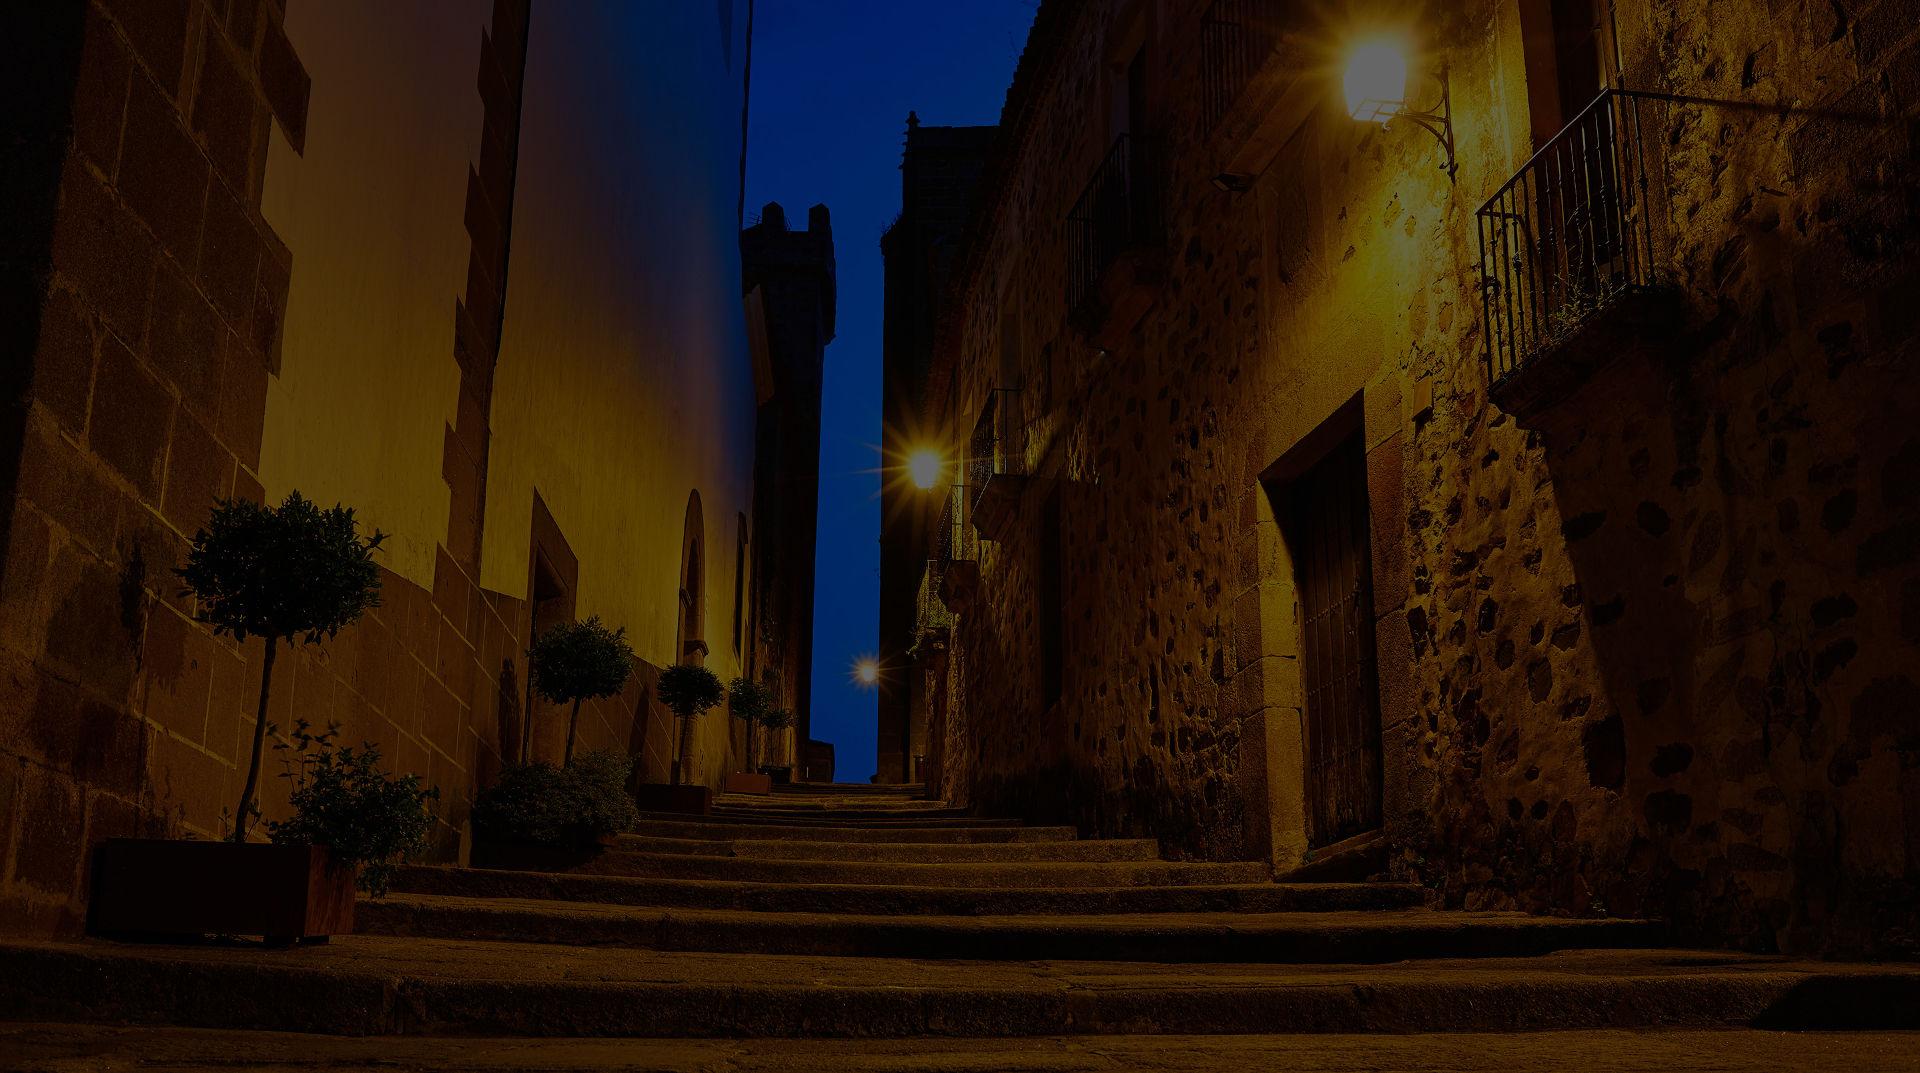 home slide 2 - Calle de Cáceres por la noche